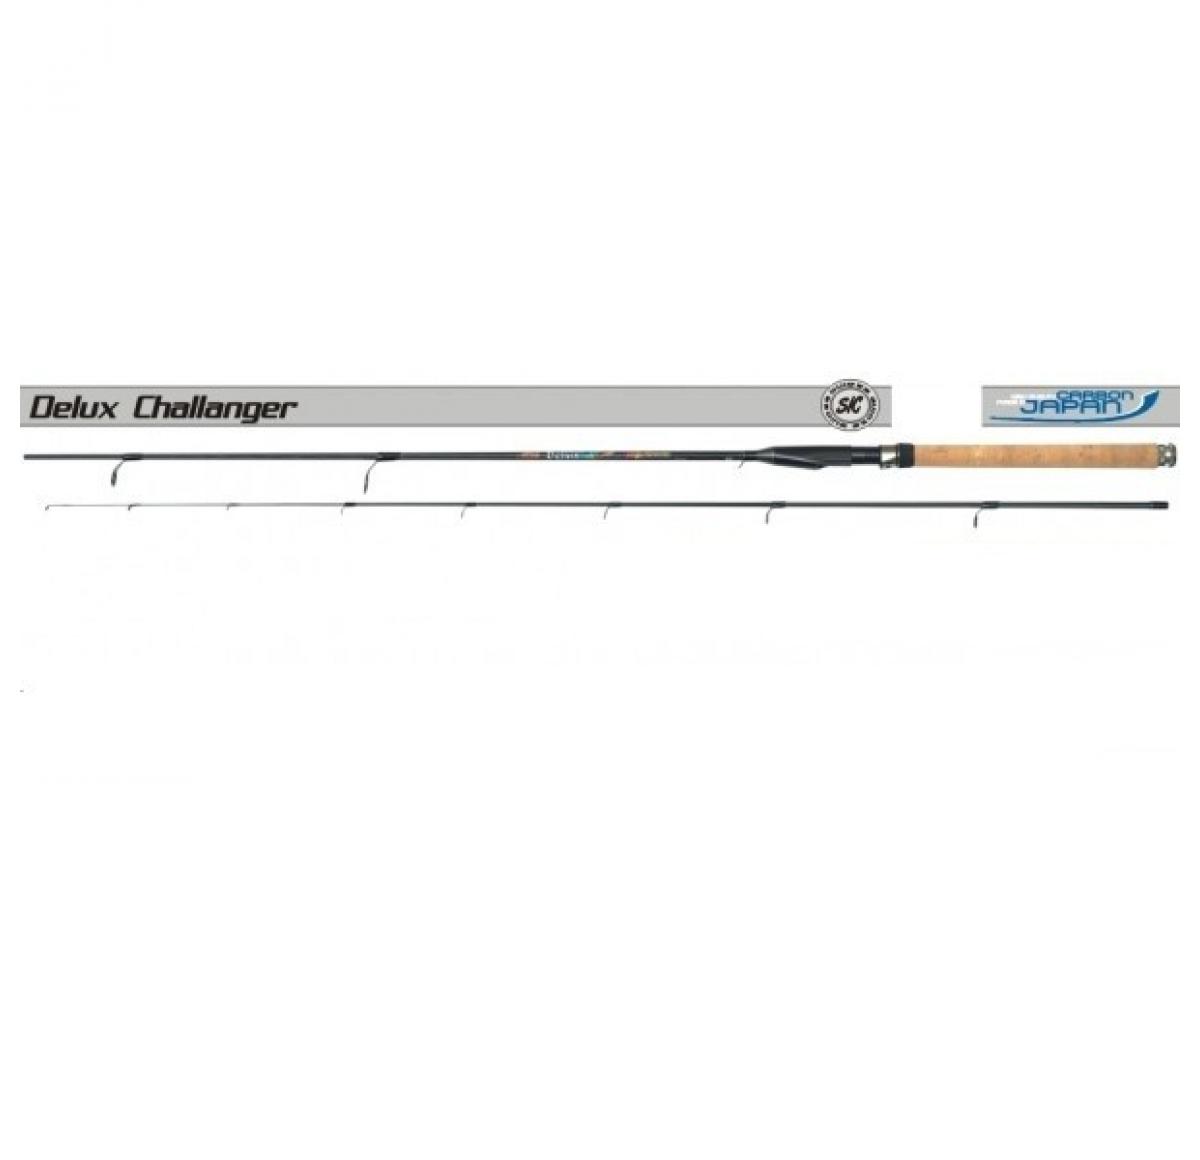 Mistrall Delux Challanger Jig 240 cm 7-15 g